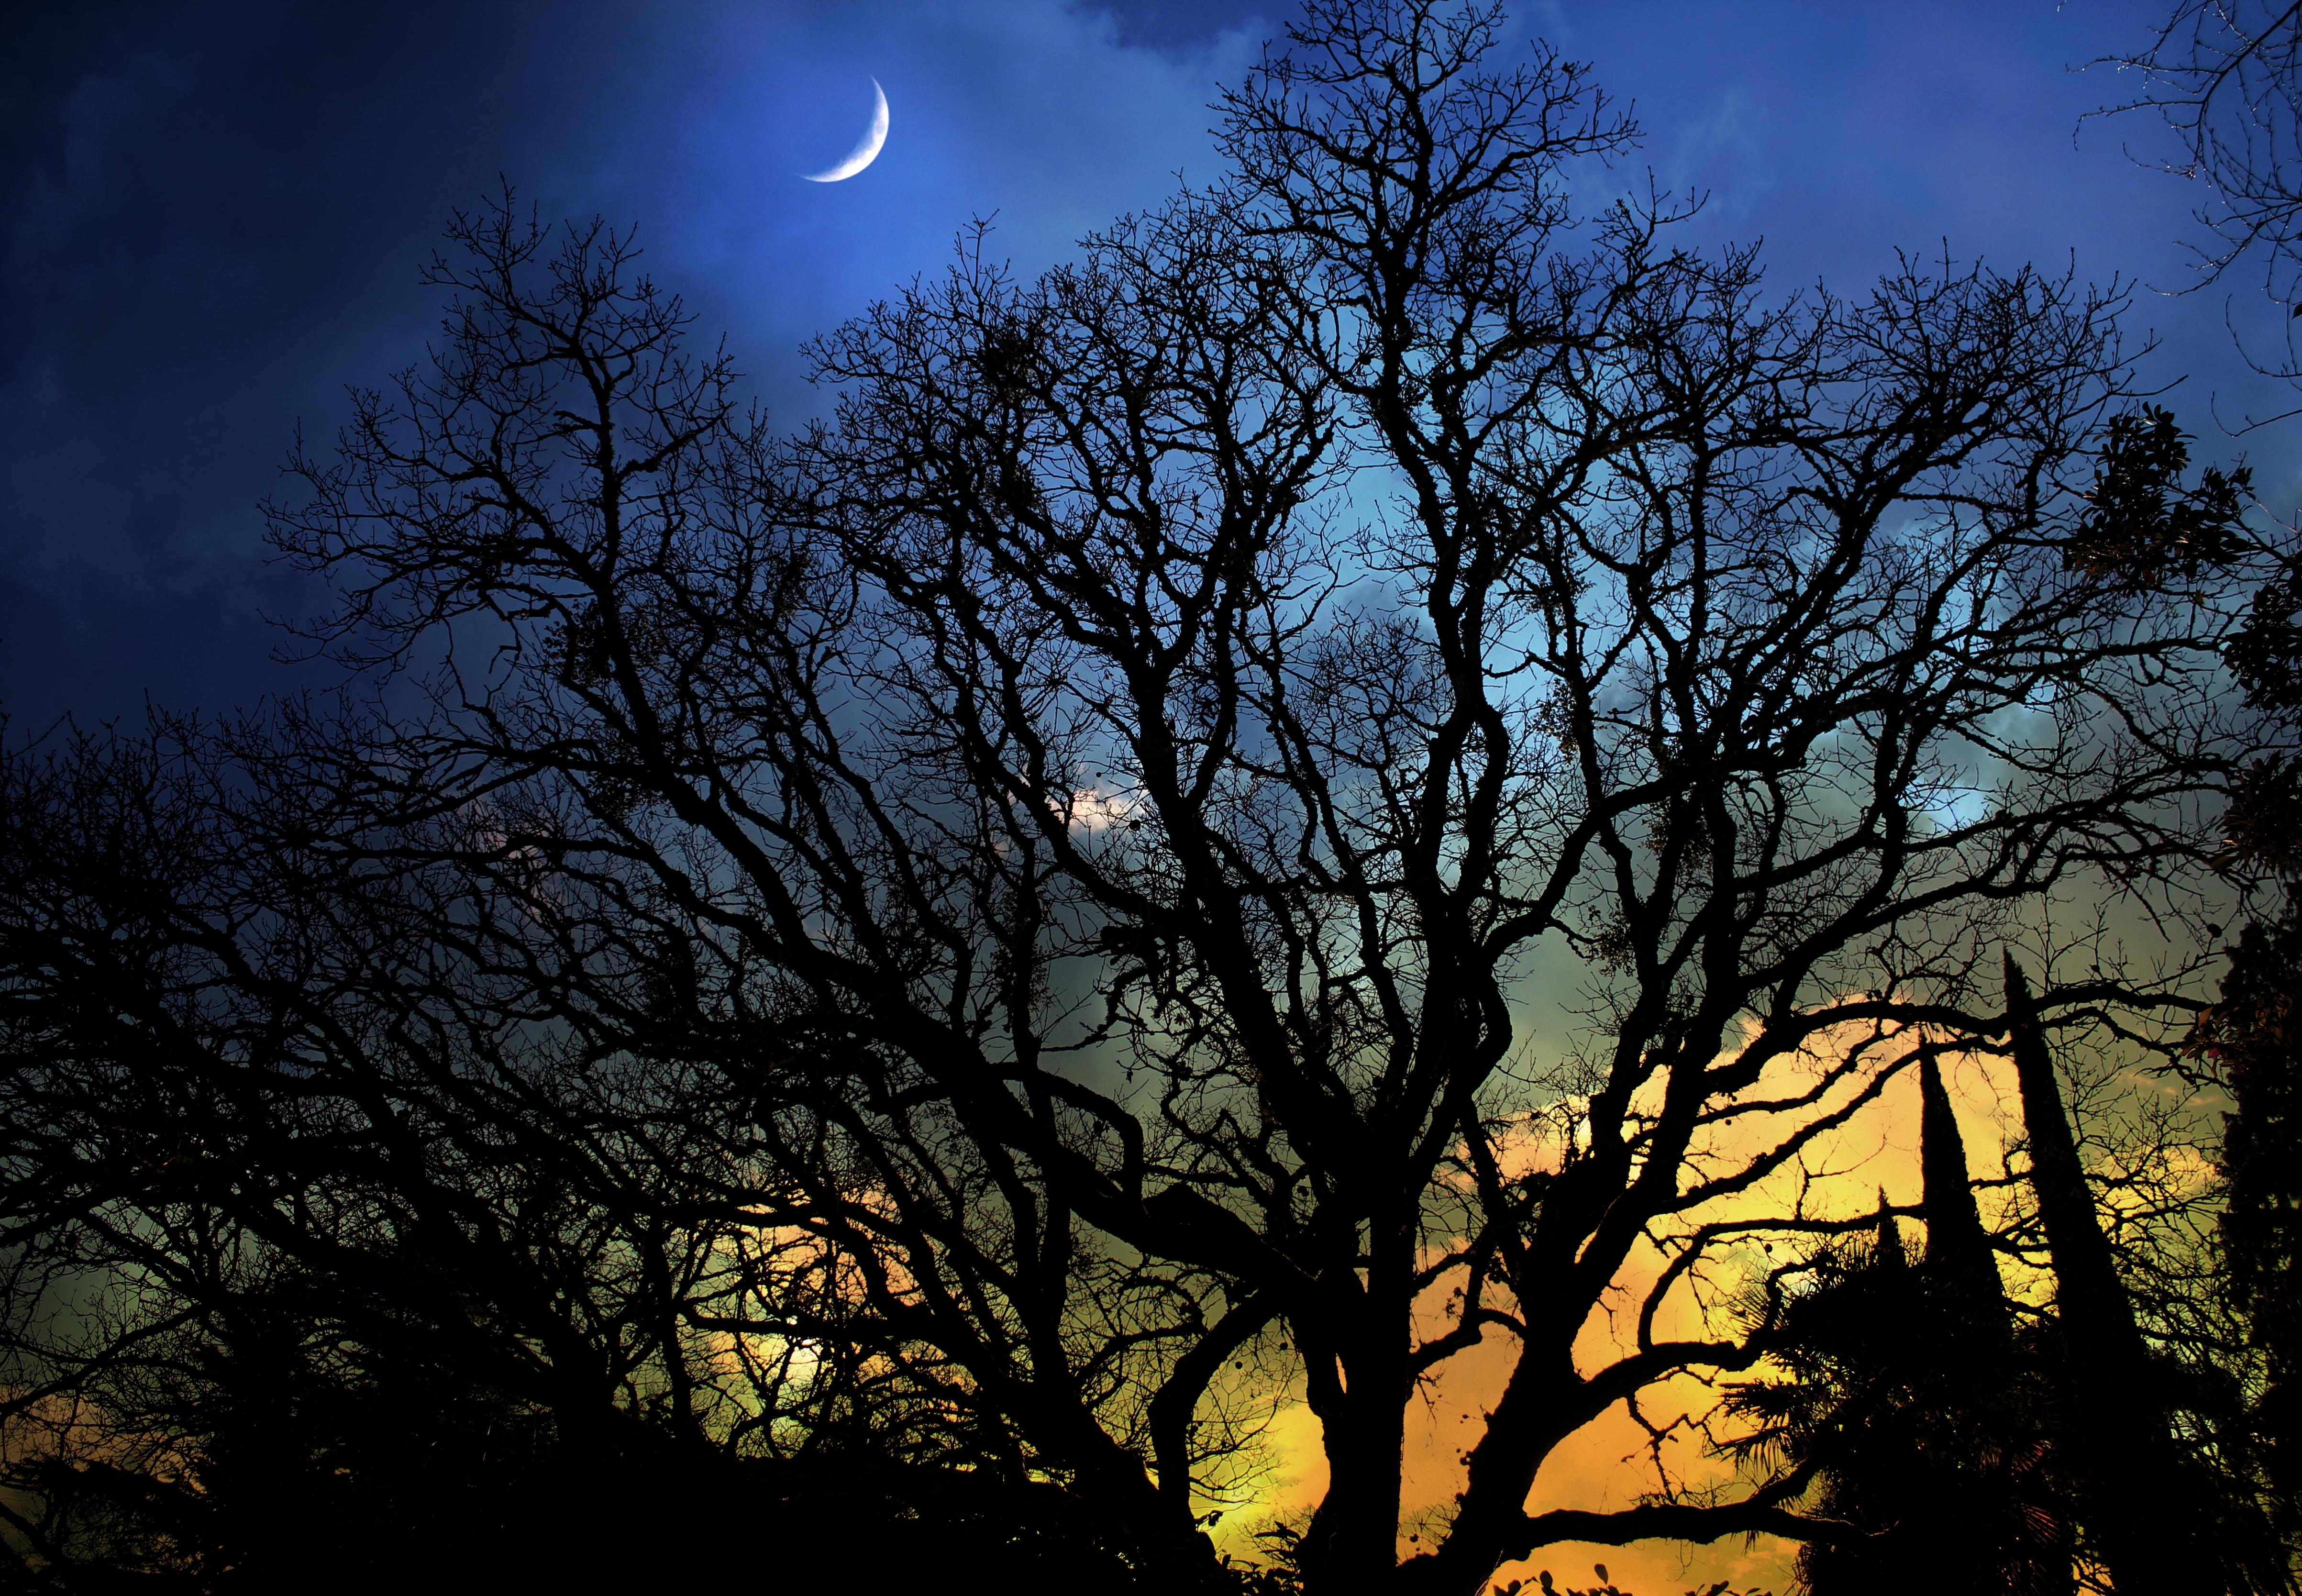 картинки деревьев ночью помимо